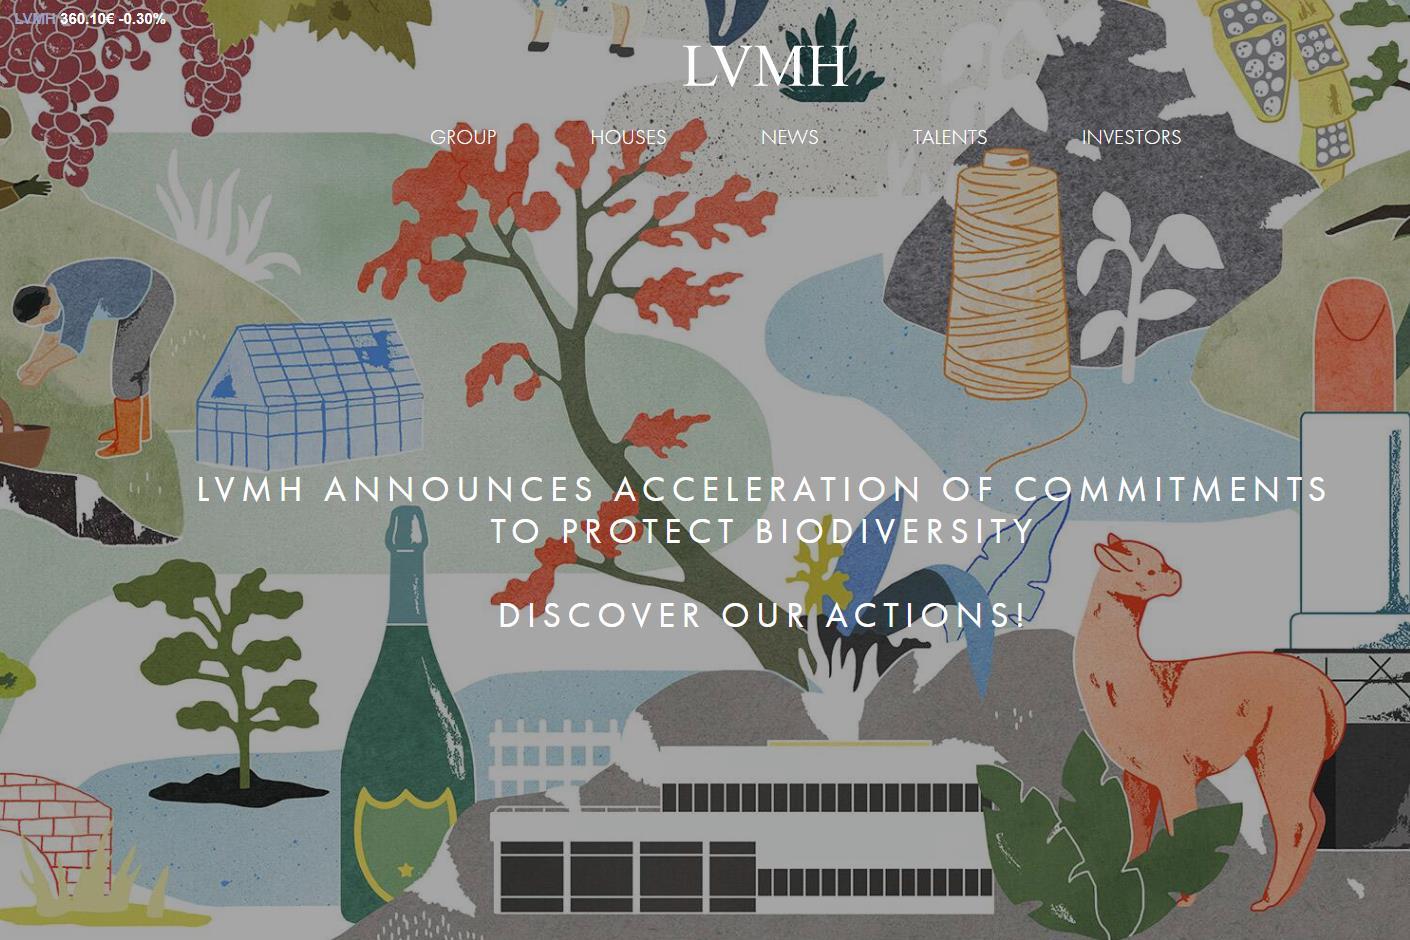 LVMH 举办 Future LIFE Paris 活动,发布全新《动物原材料采购宪章》